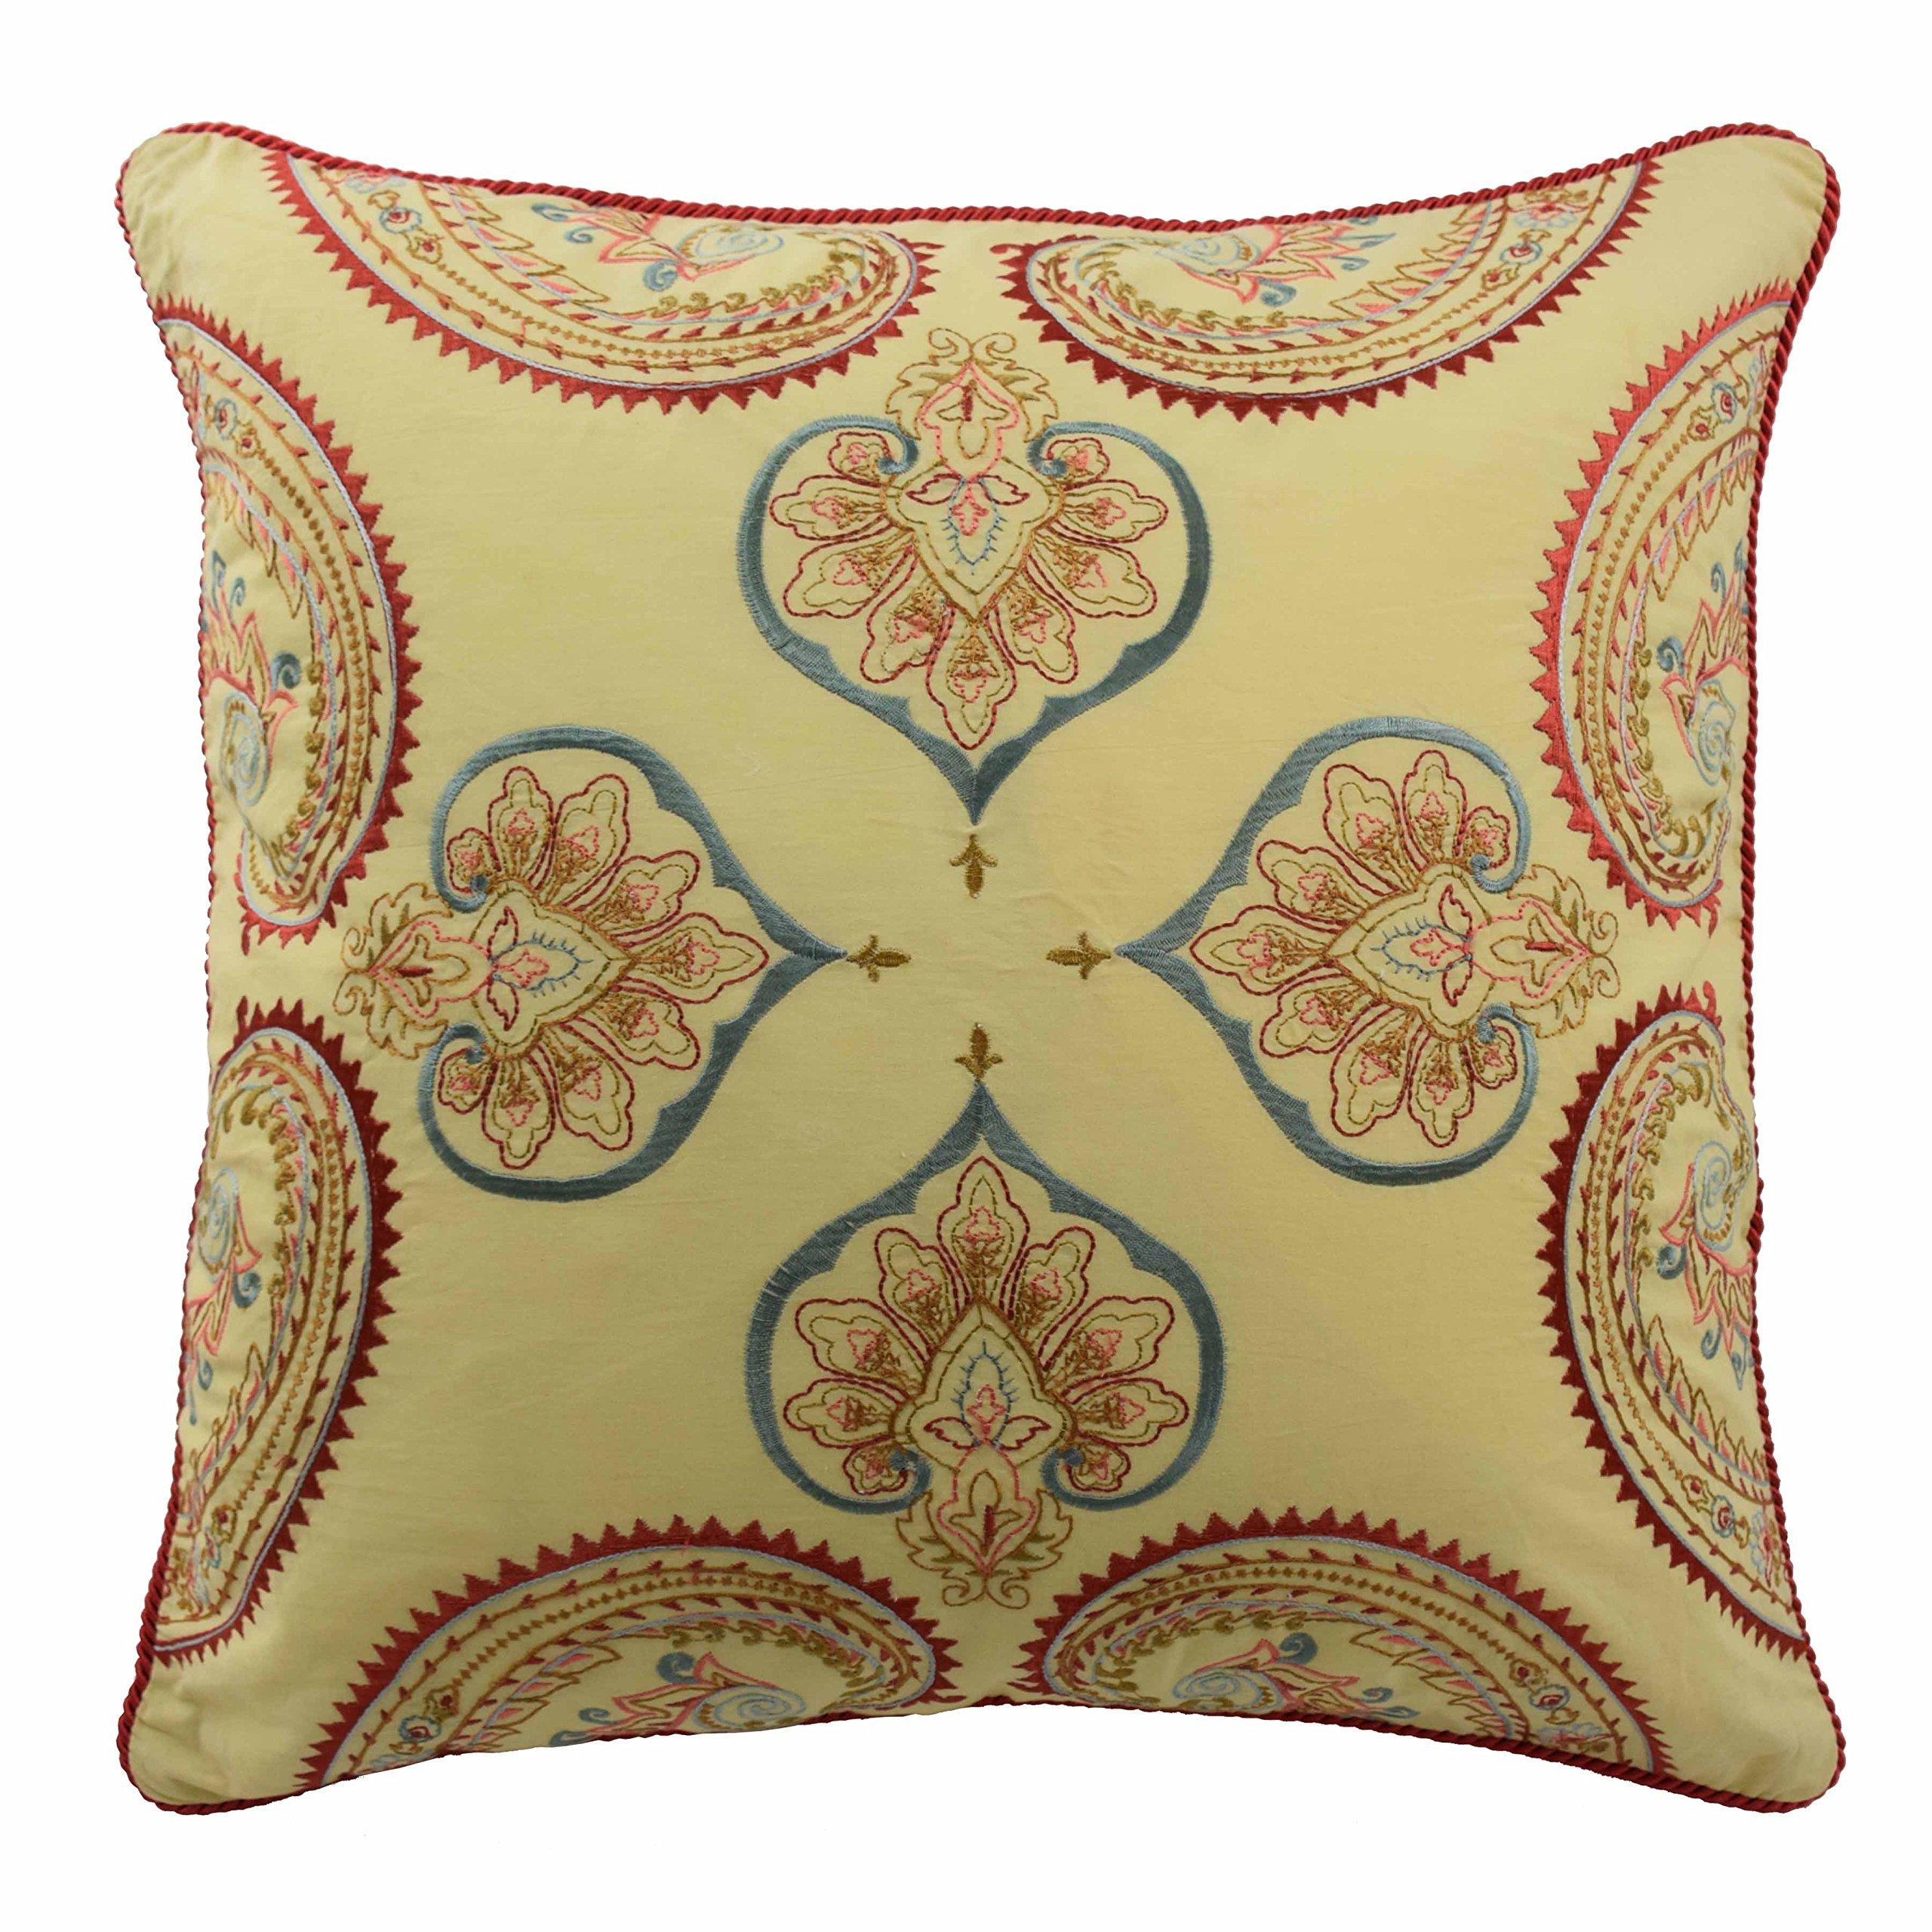 WAVERLY Swept Away Decorative Pillow, 18x18, Berry